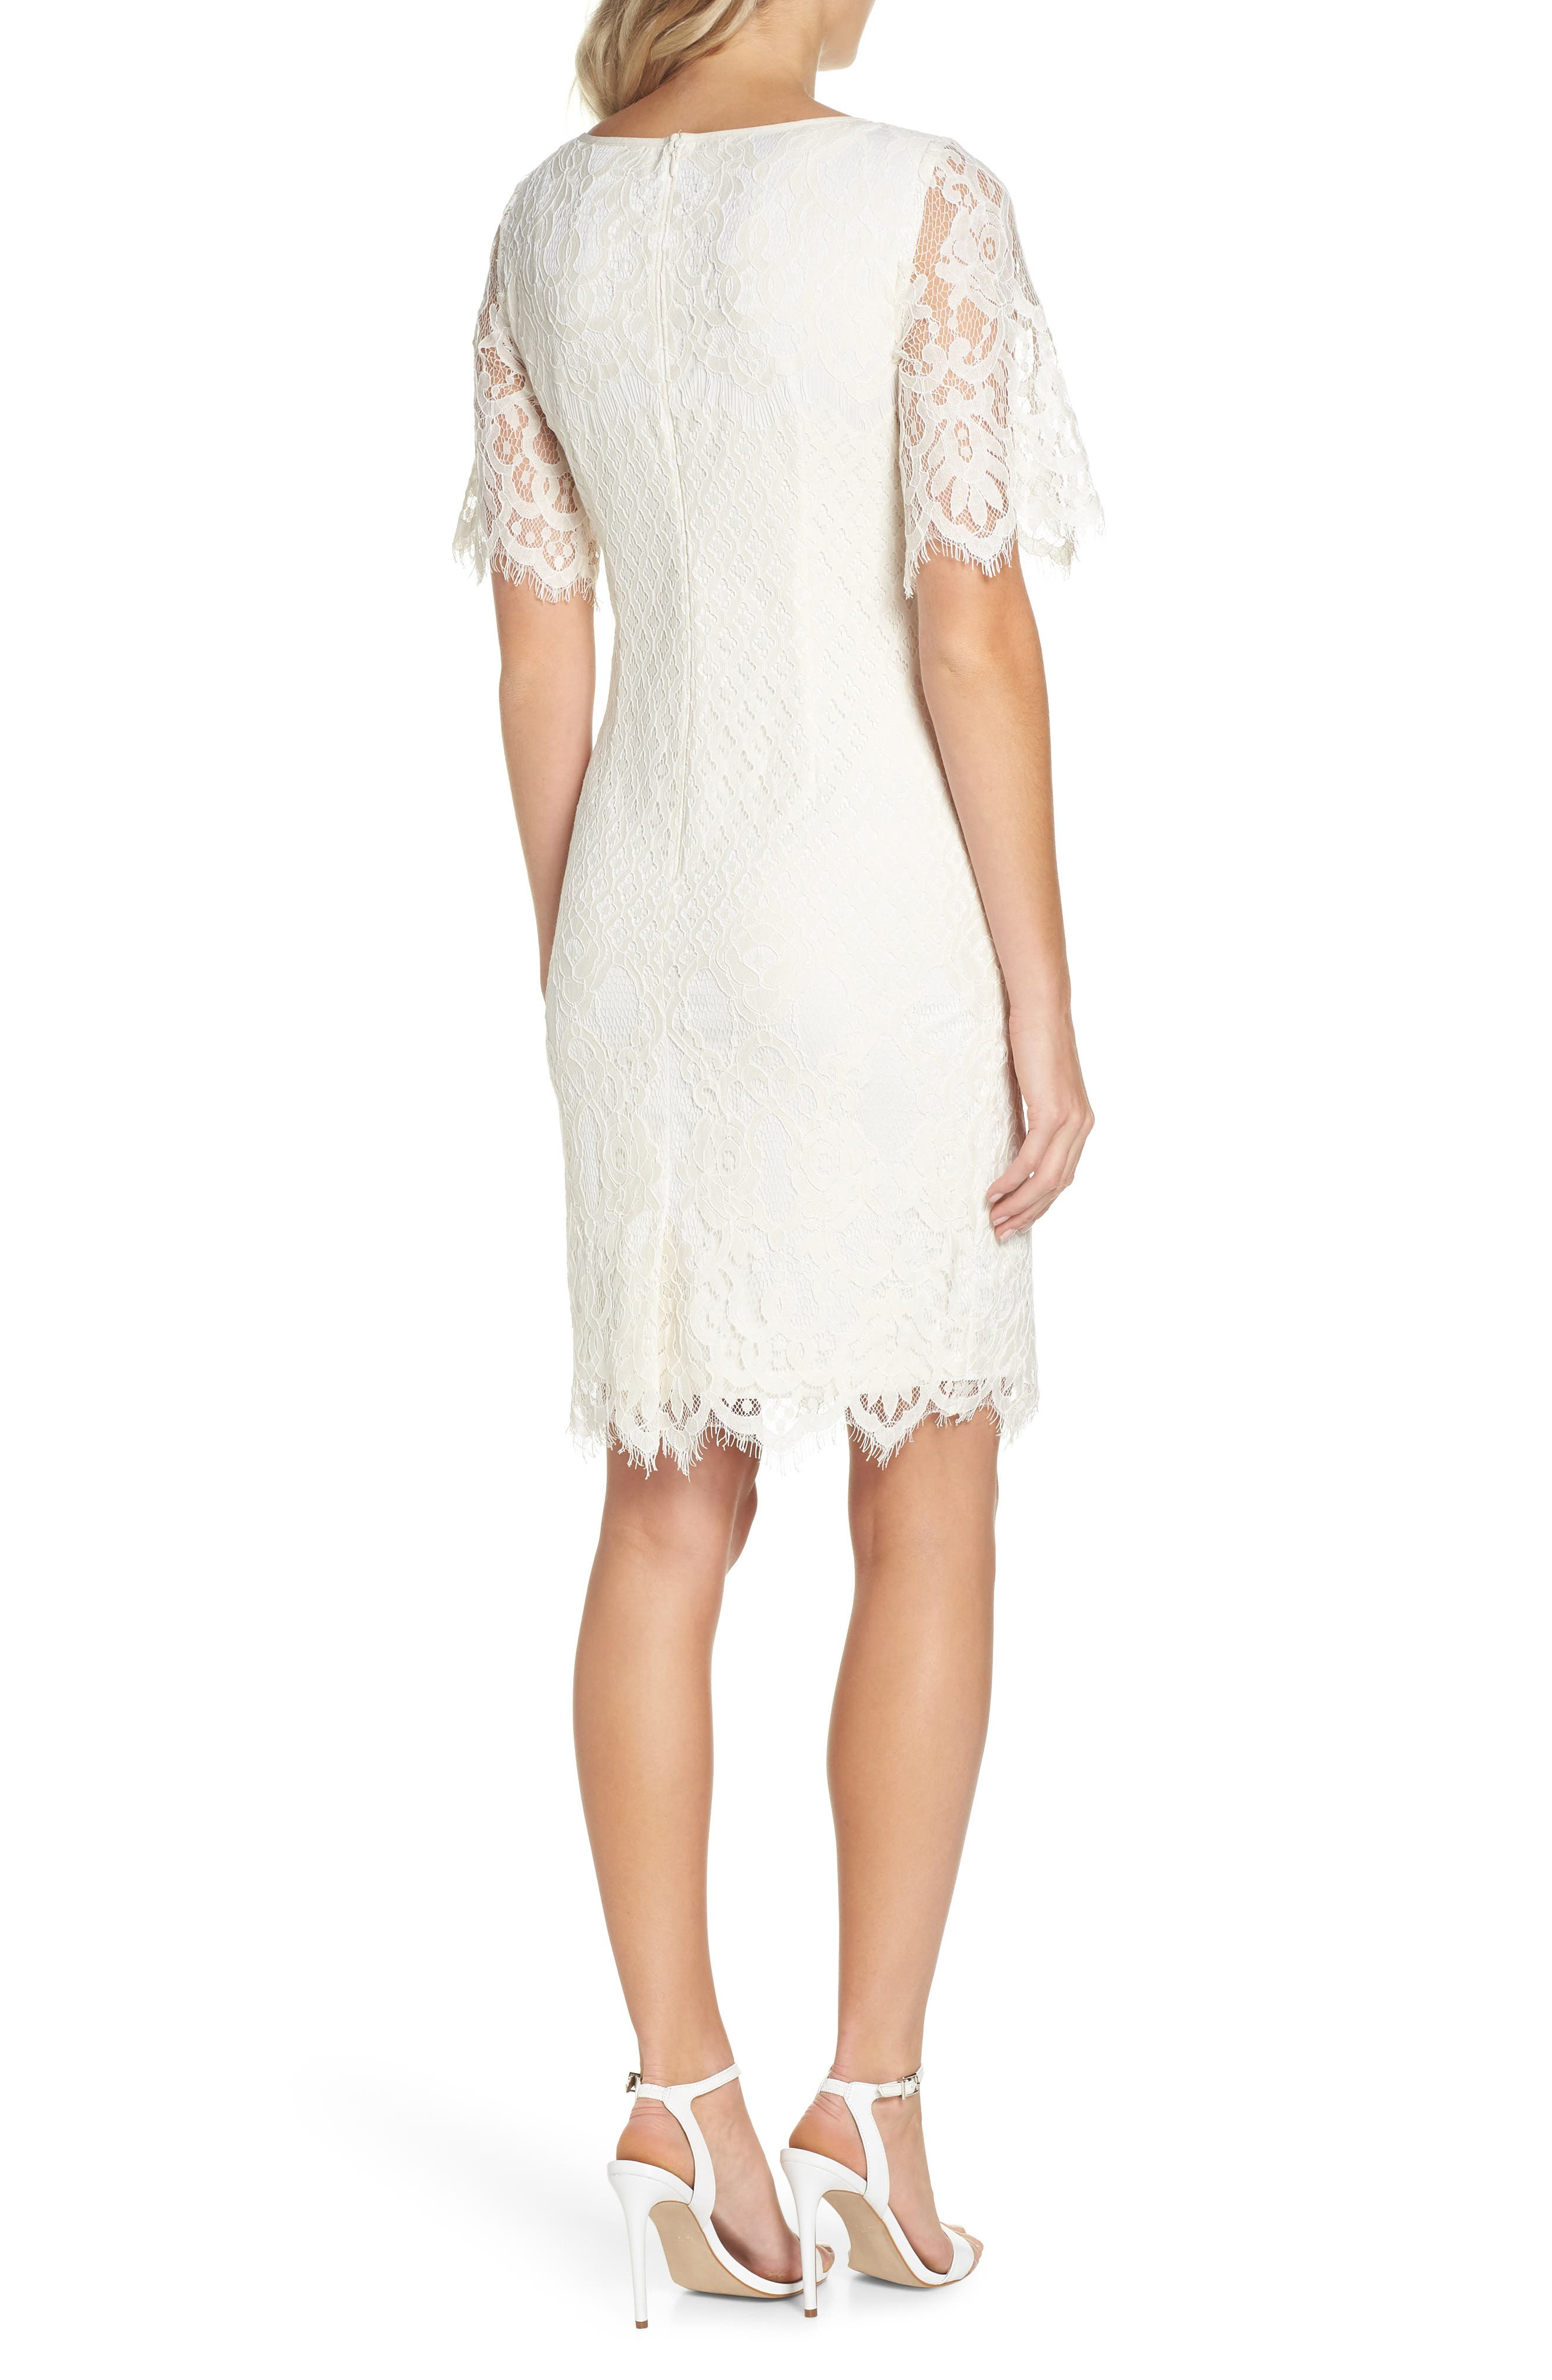 Georgia Scalloped Lace Sheath Dress,                             Alternate thumbnail 2, color,                             904